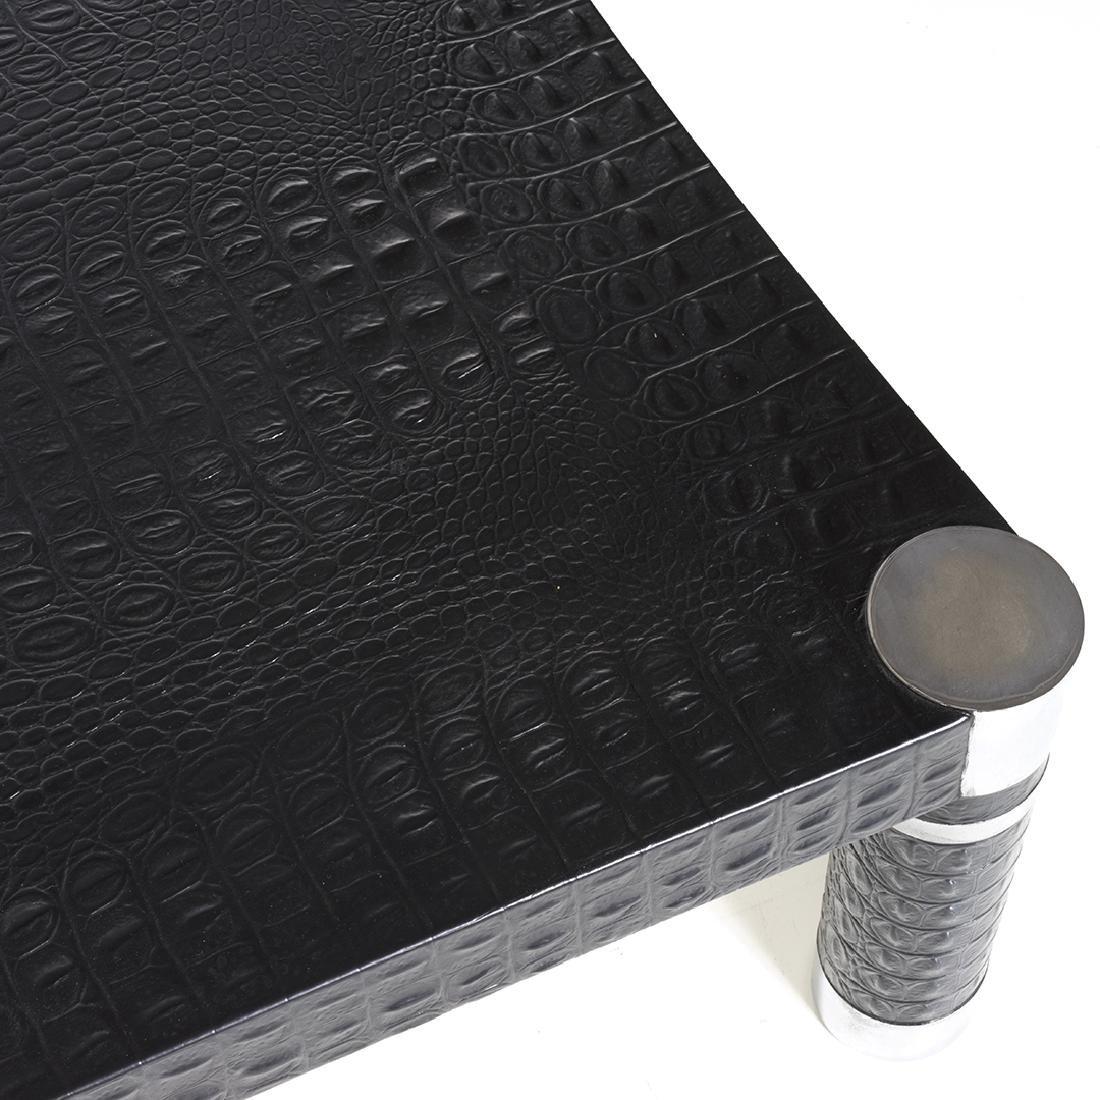 Karl Springer Embossed Leather Coffee Table - 2